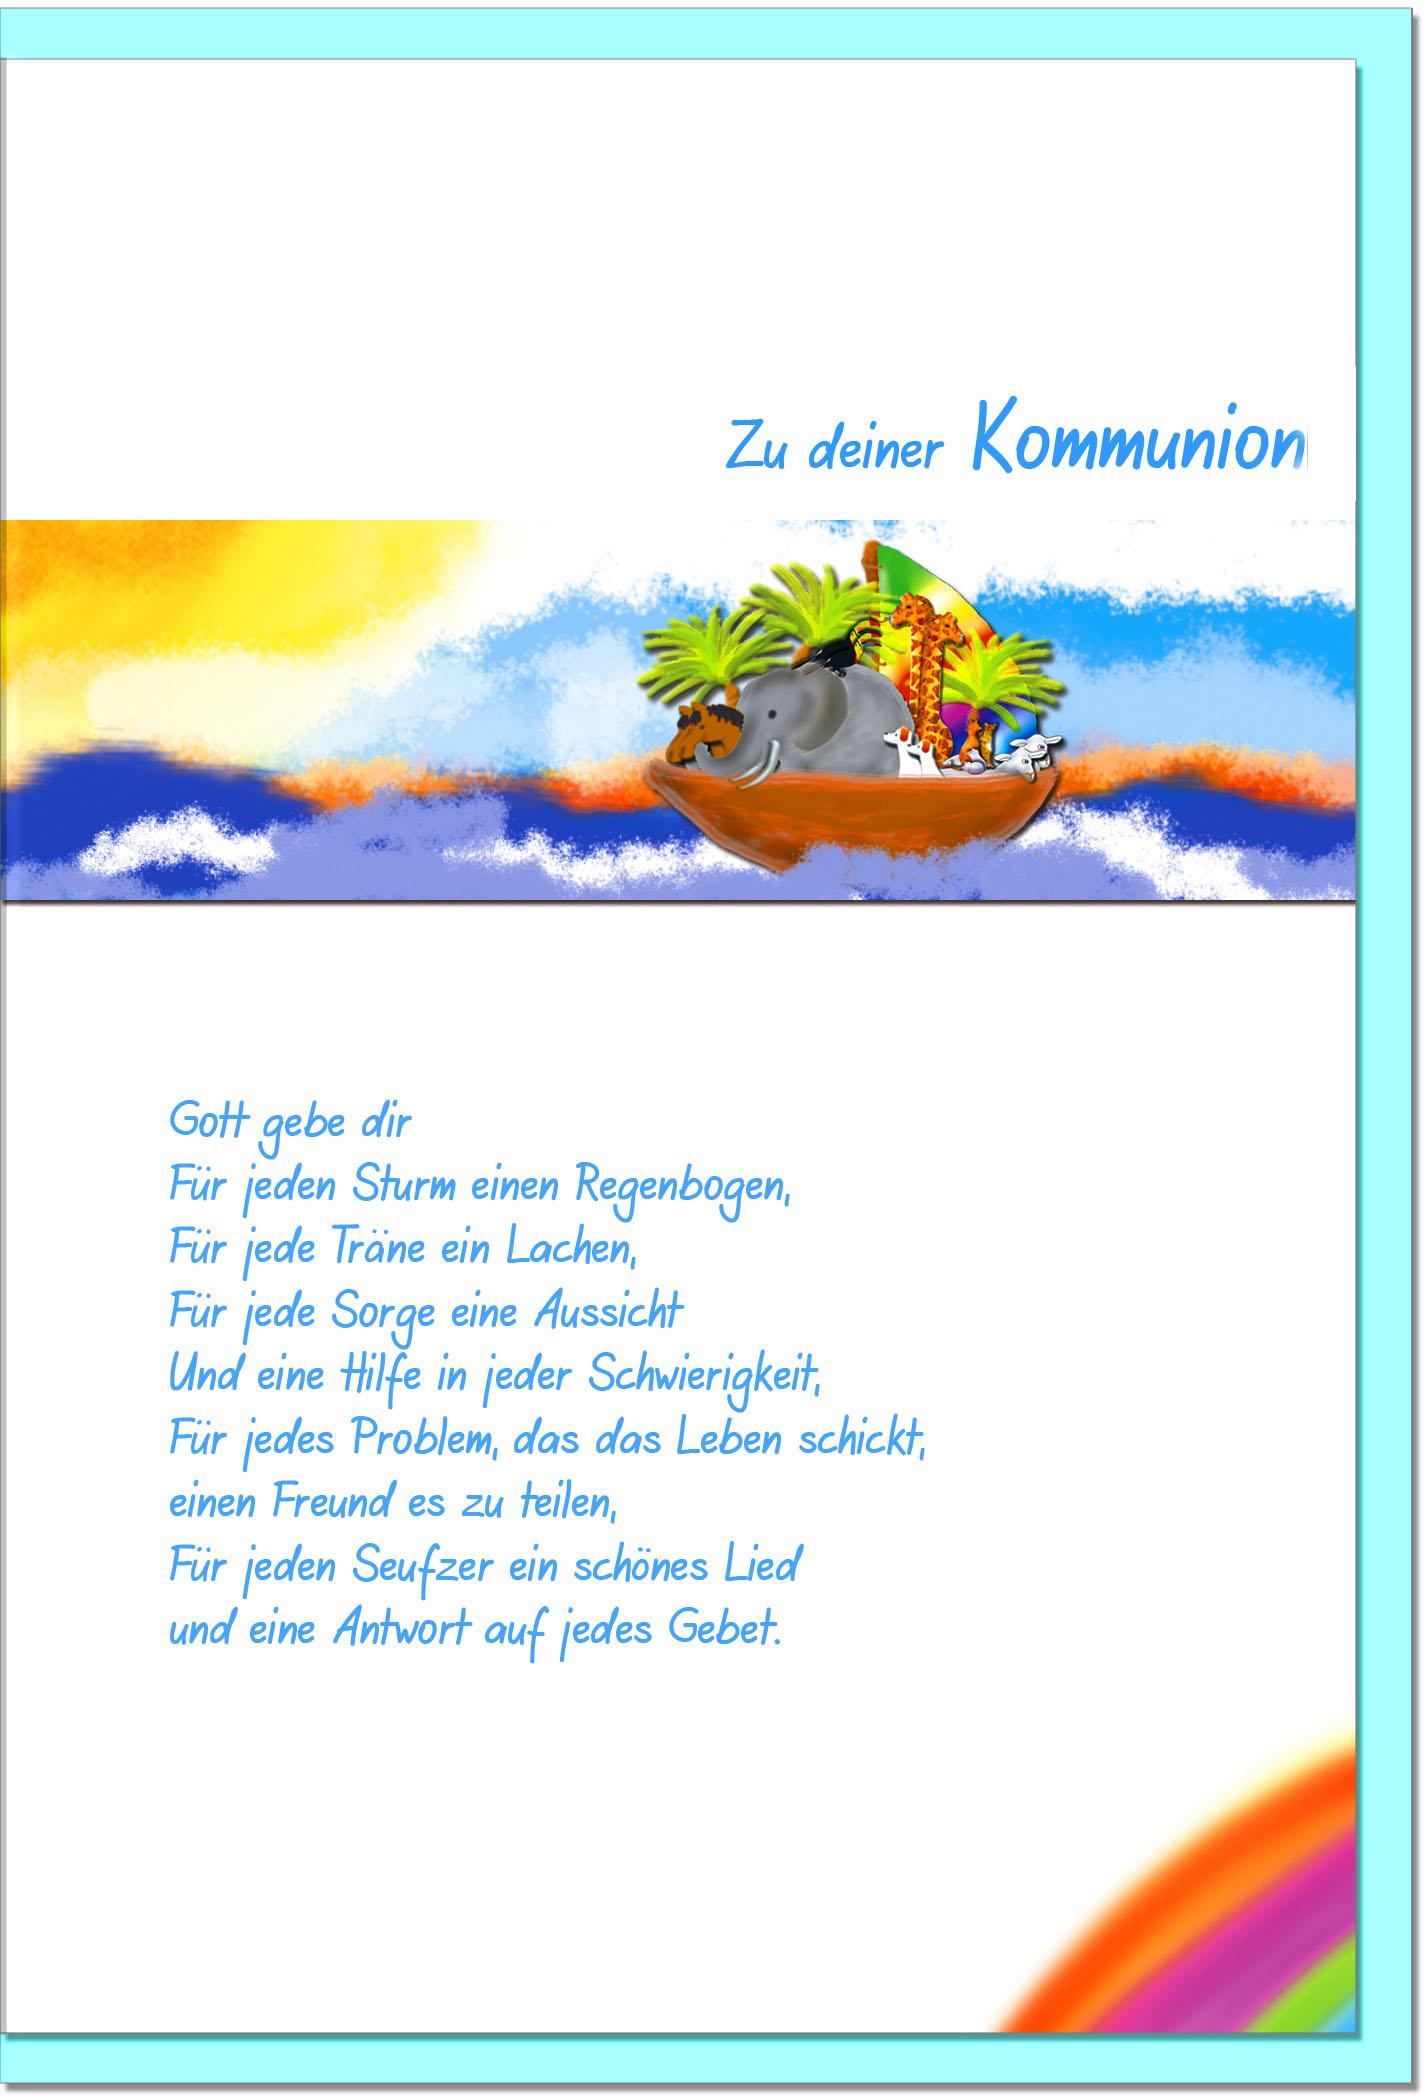 Kommunionskarten / Grußkarten /Kommunion Arche Noah